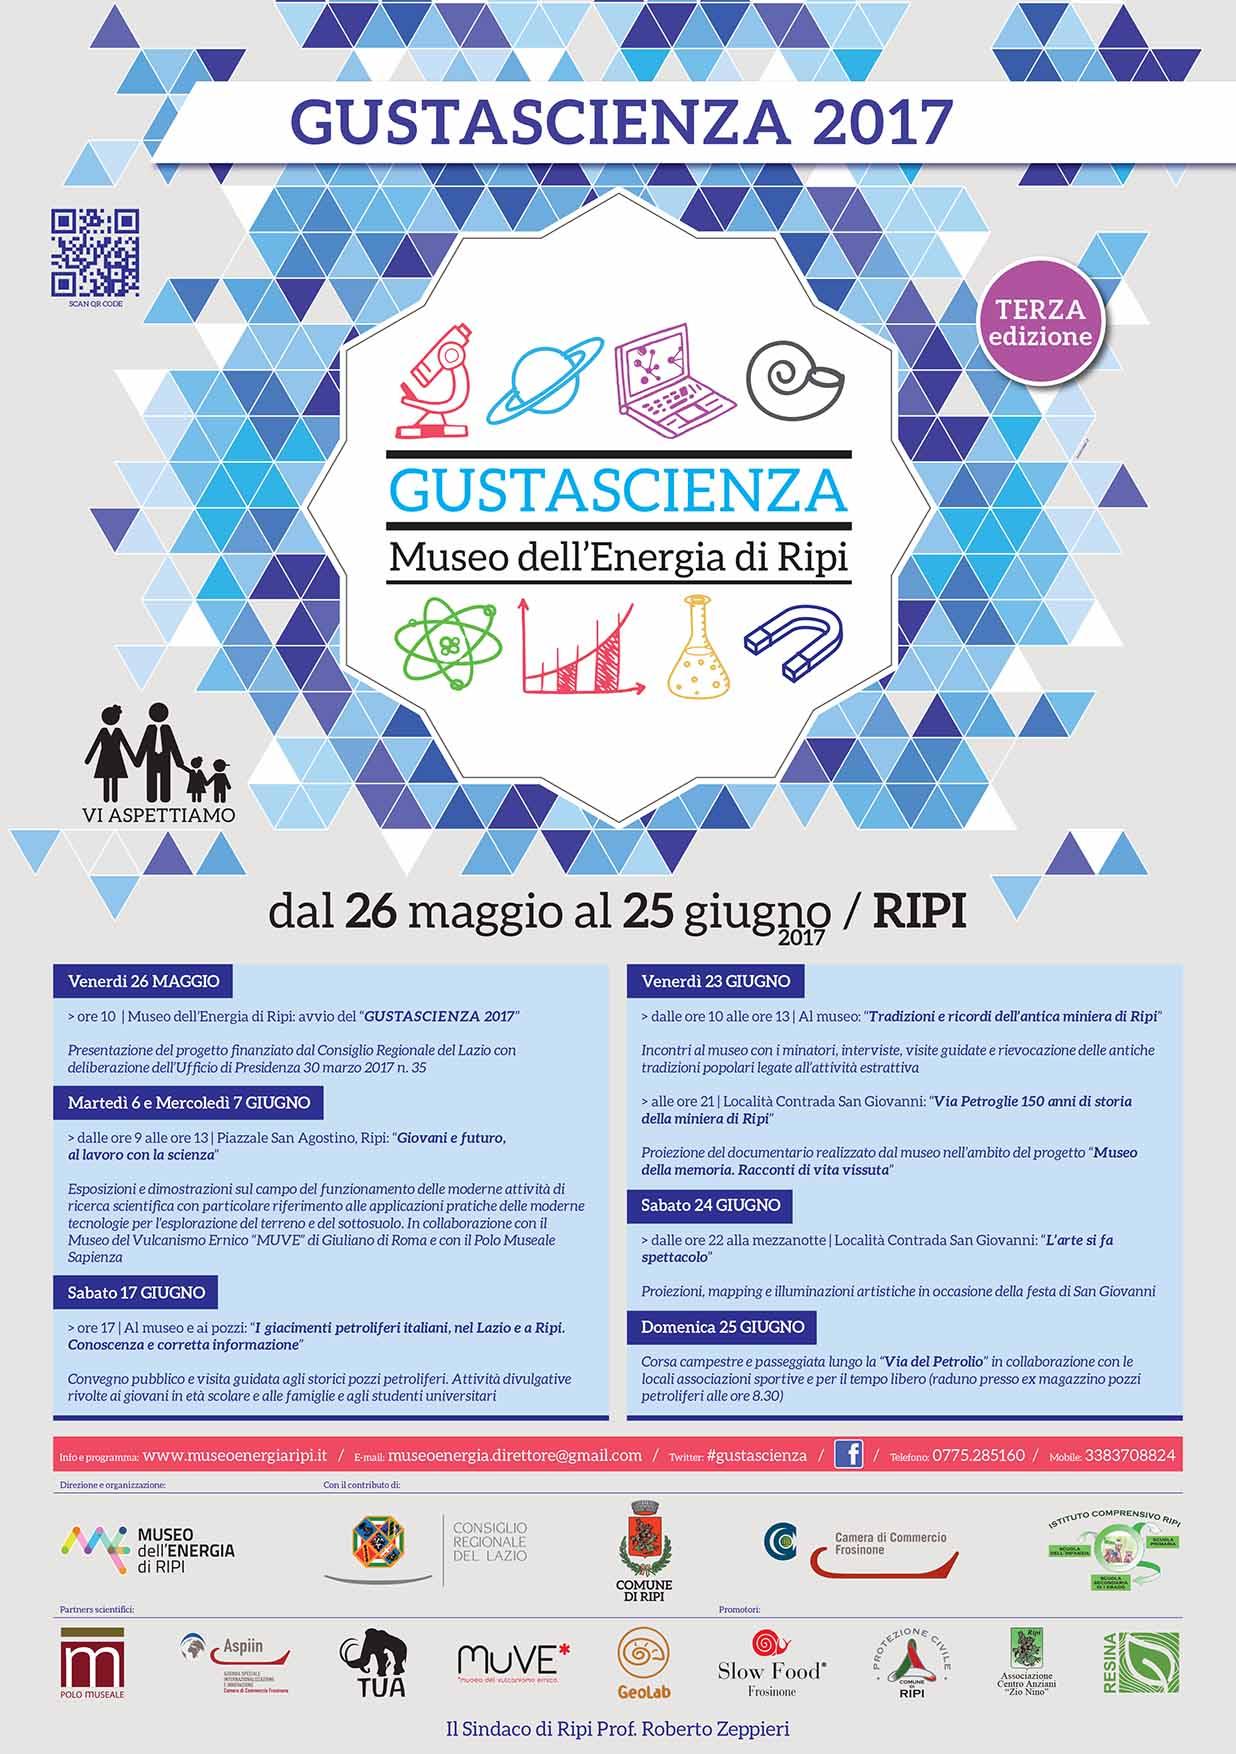 Gustascienza_poster_1000x700